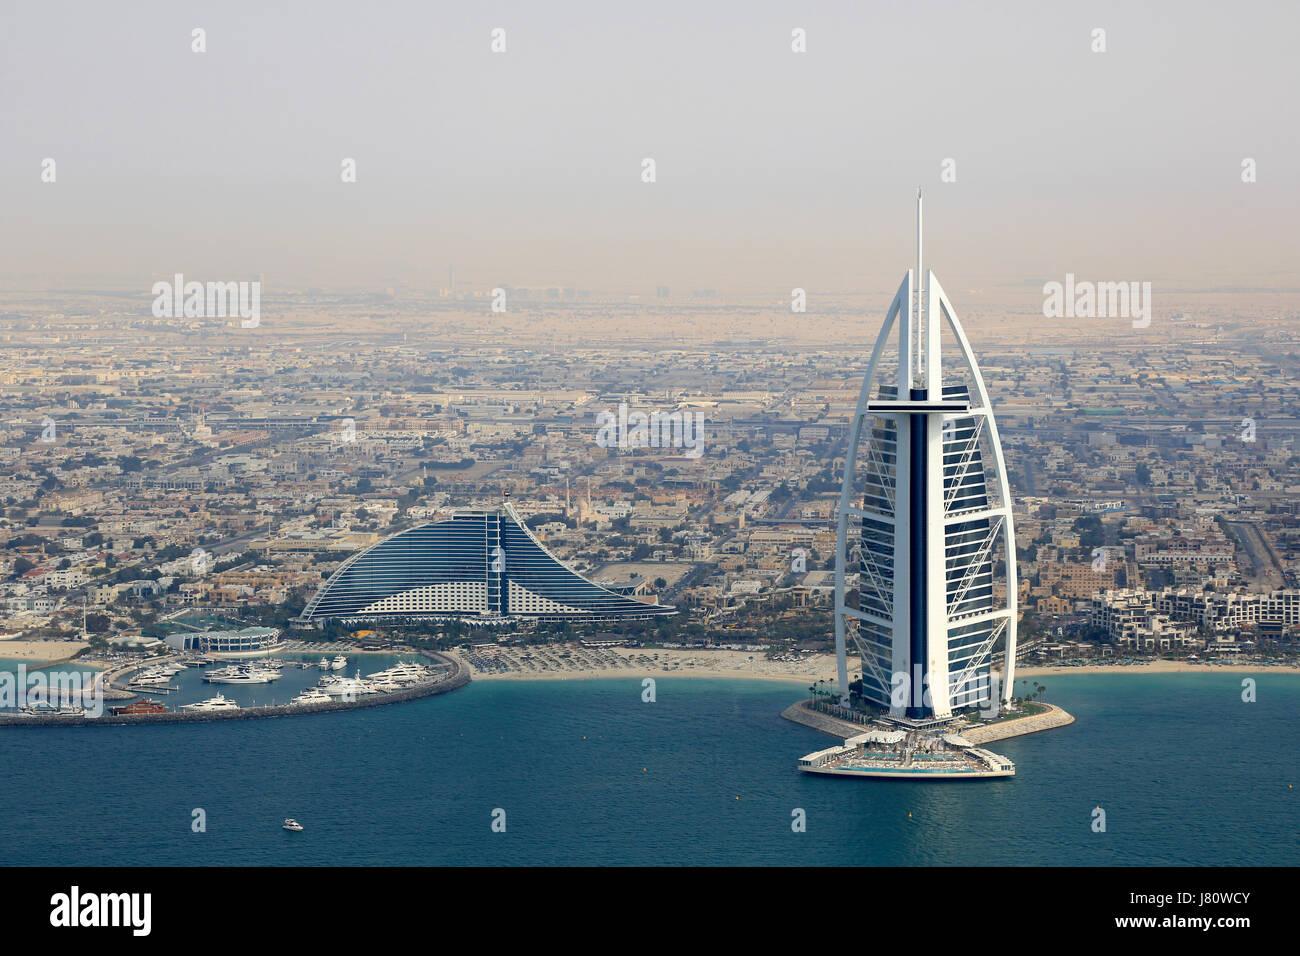 El burj al arab de Dubai Jumeirah Beach hotel vista aérea fotografía eau Imagen De Stock